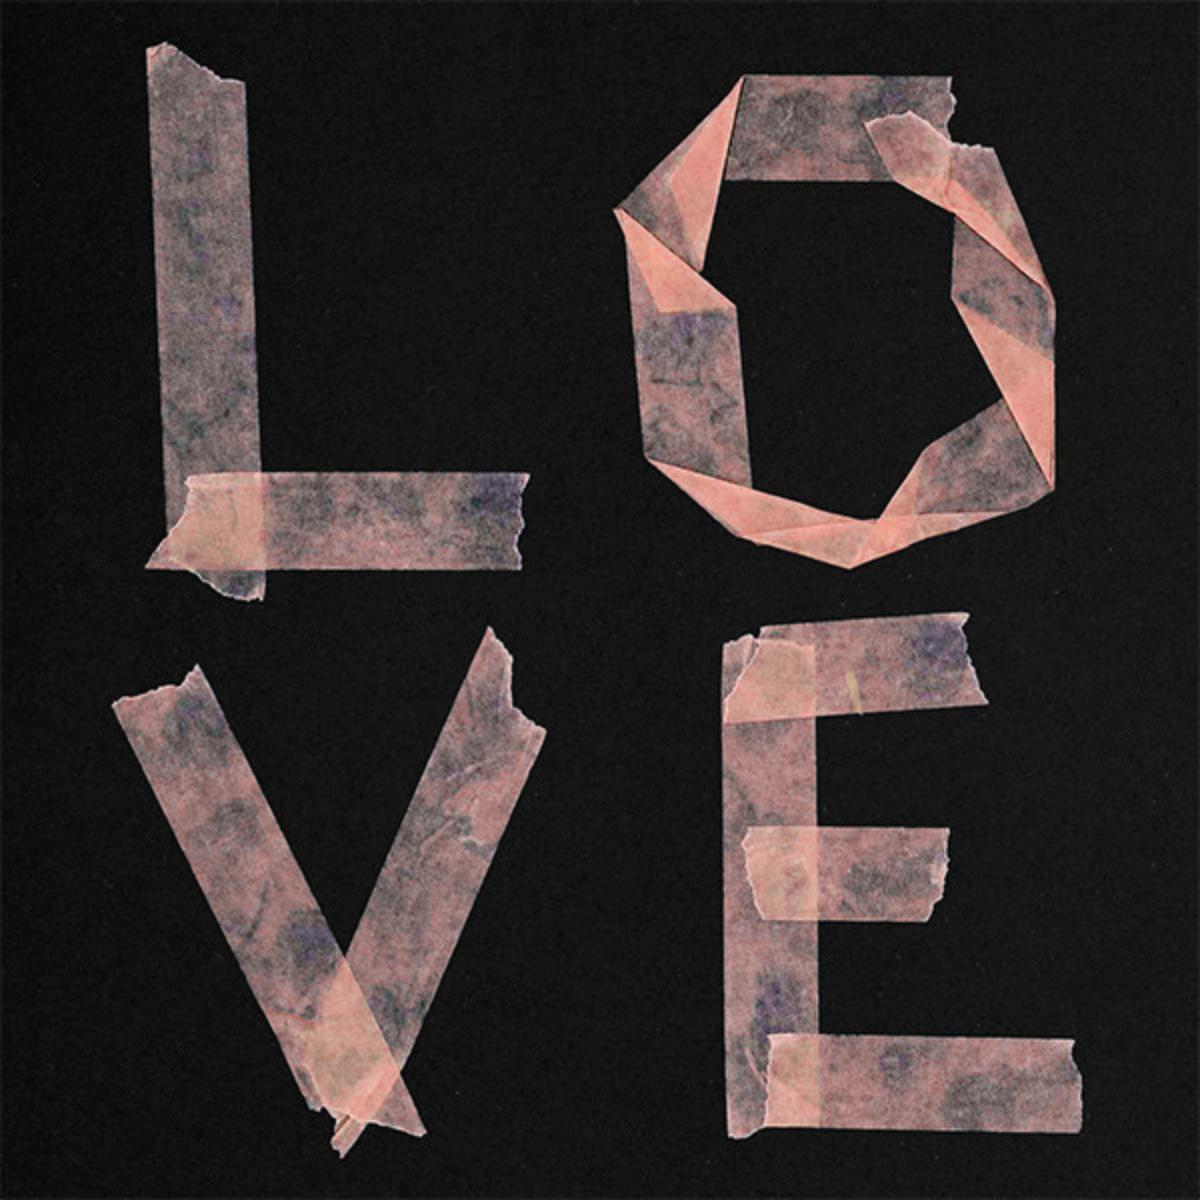 Stuck on You - Kelly Wearstler - Valentine's Day